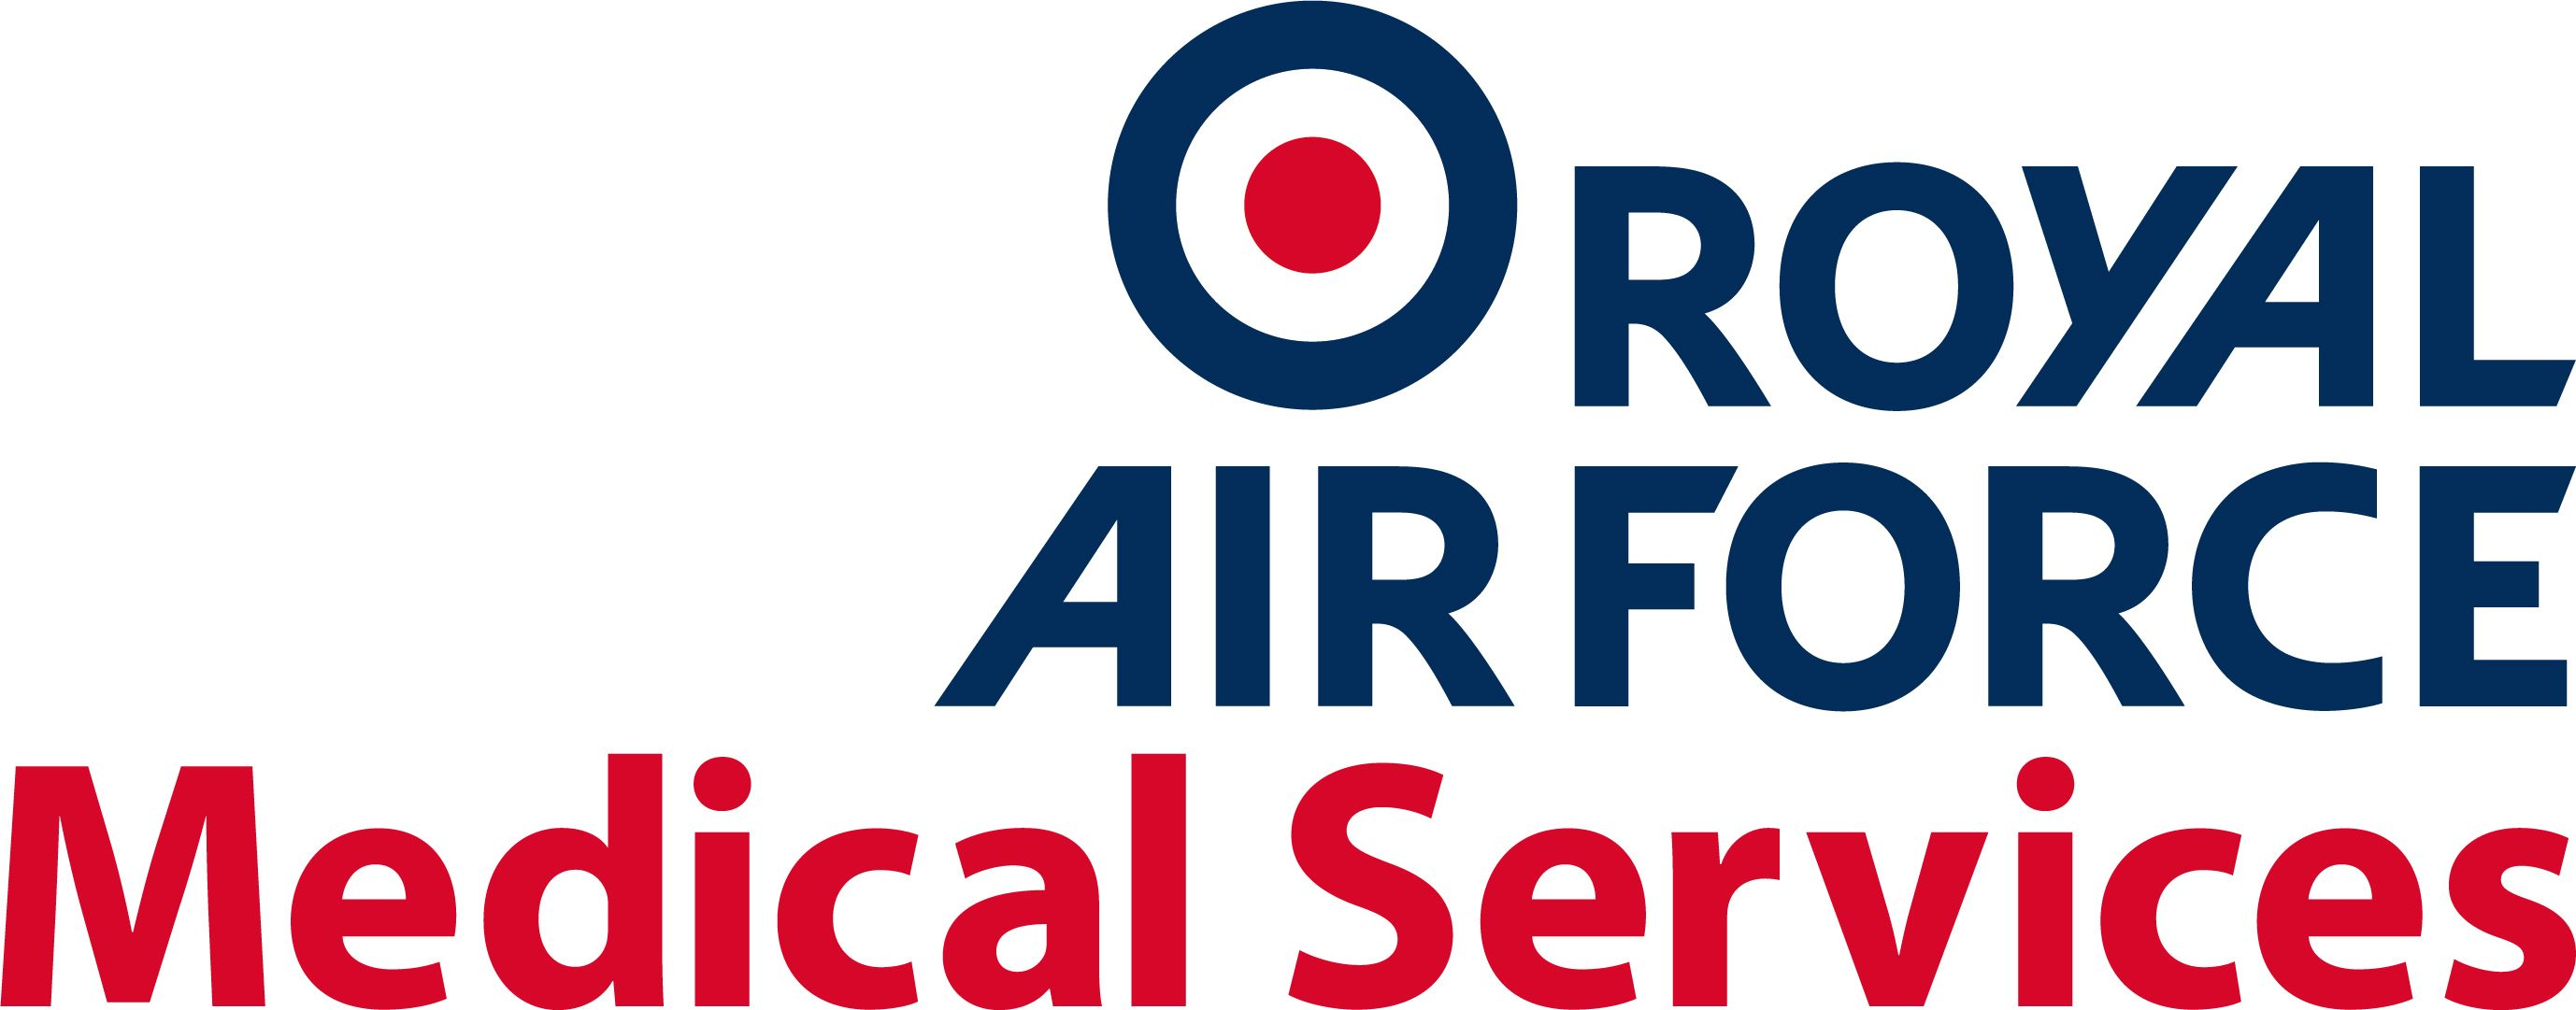 Royal Air Force Medical Services